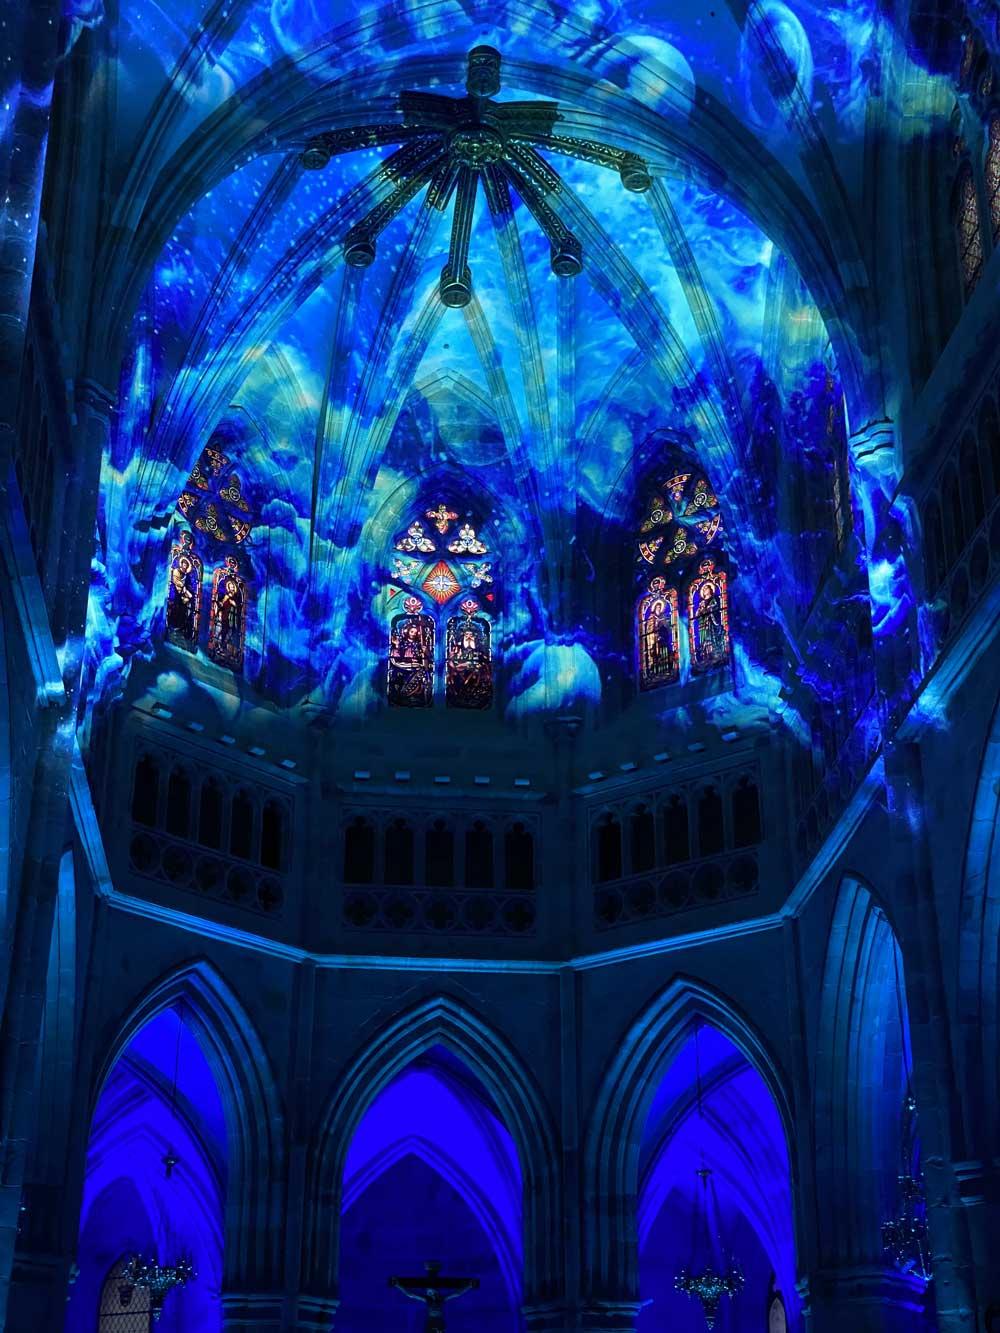 Necsum lightart arte digital Requiem